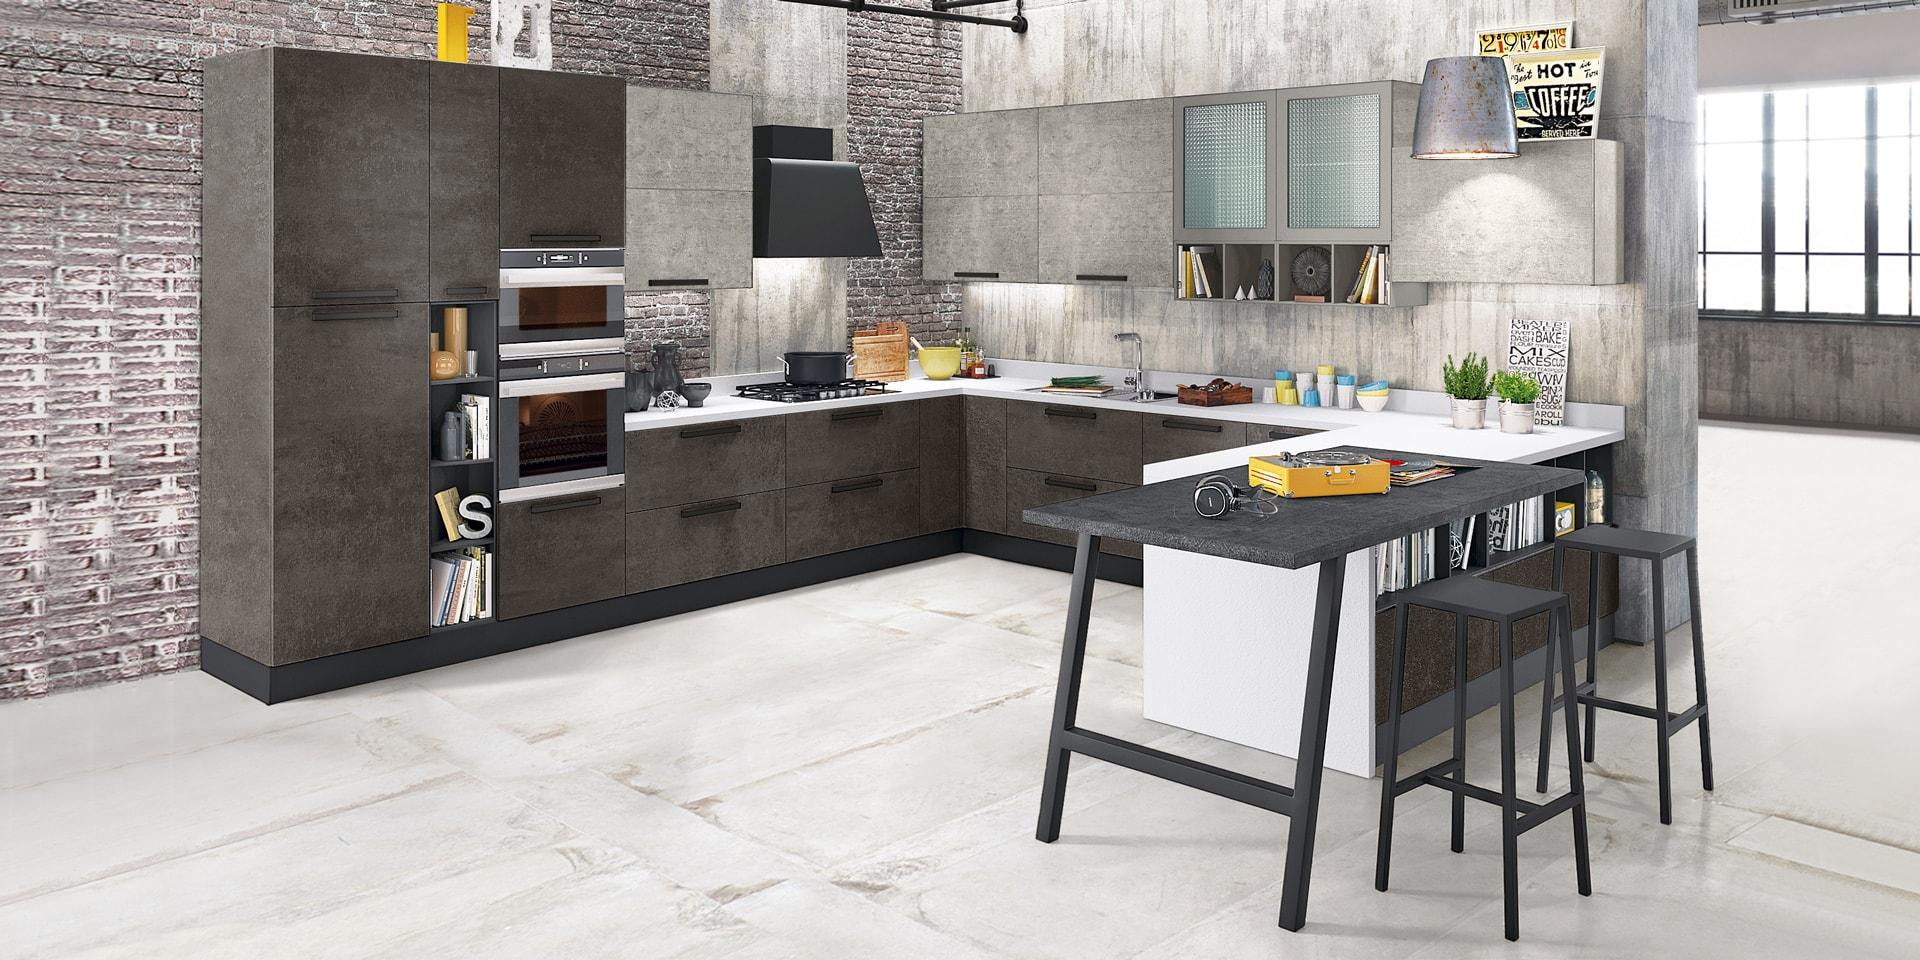 Cucine arredi genova simple cucine with cucine arredi - Mobili cucina genova ...